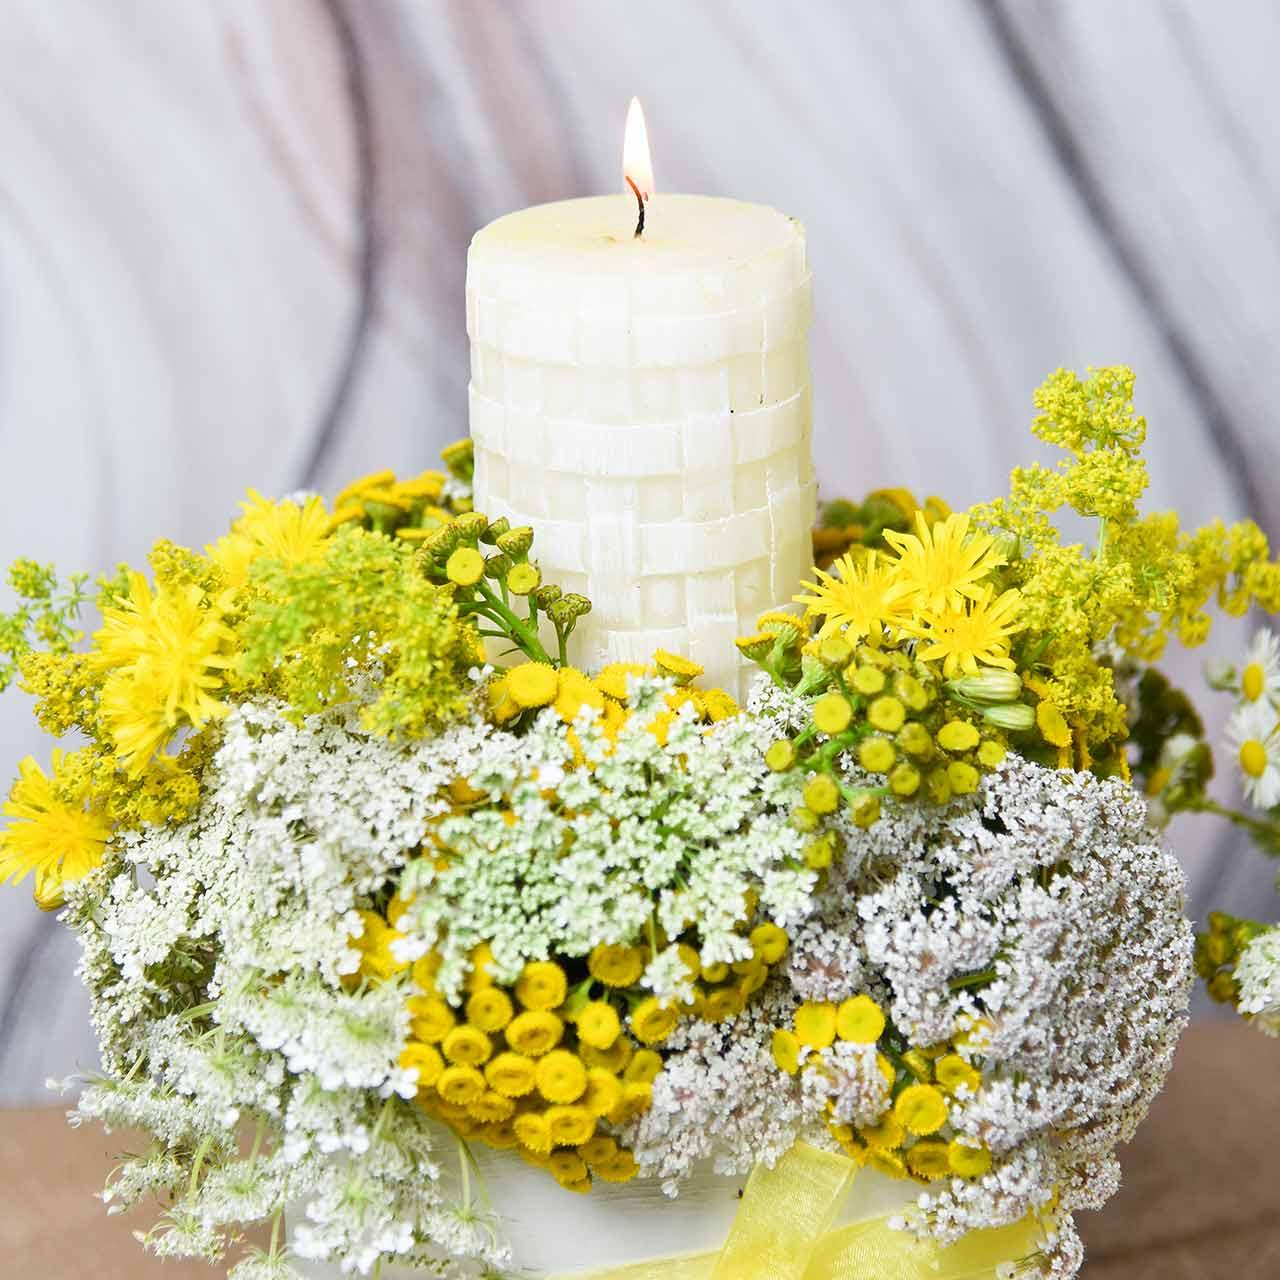 Rustic candles, white wax candles, pillar candles basket pattern 110/65 2pcs